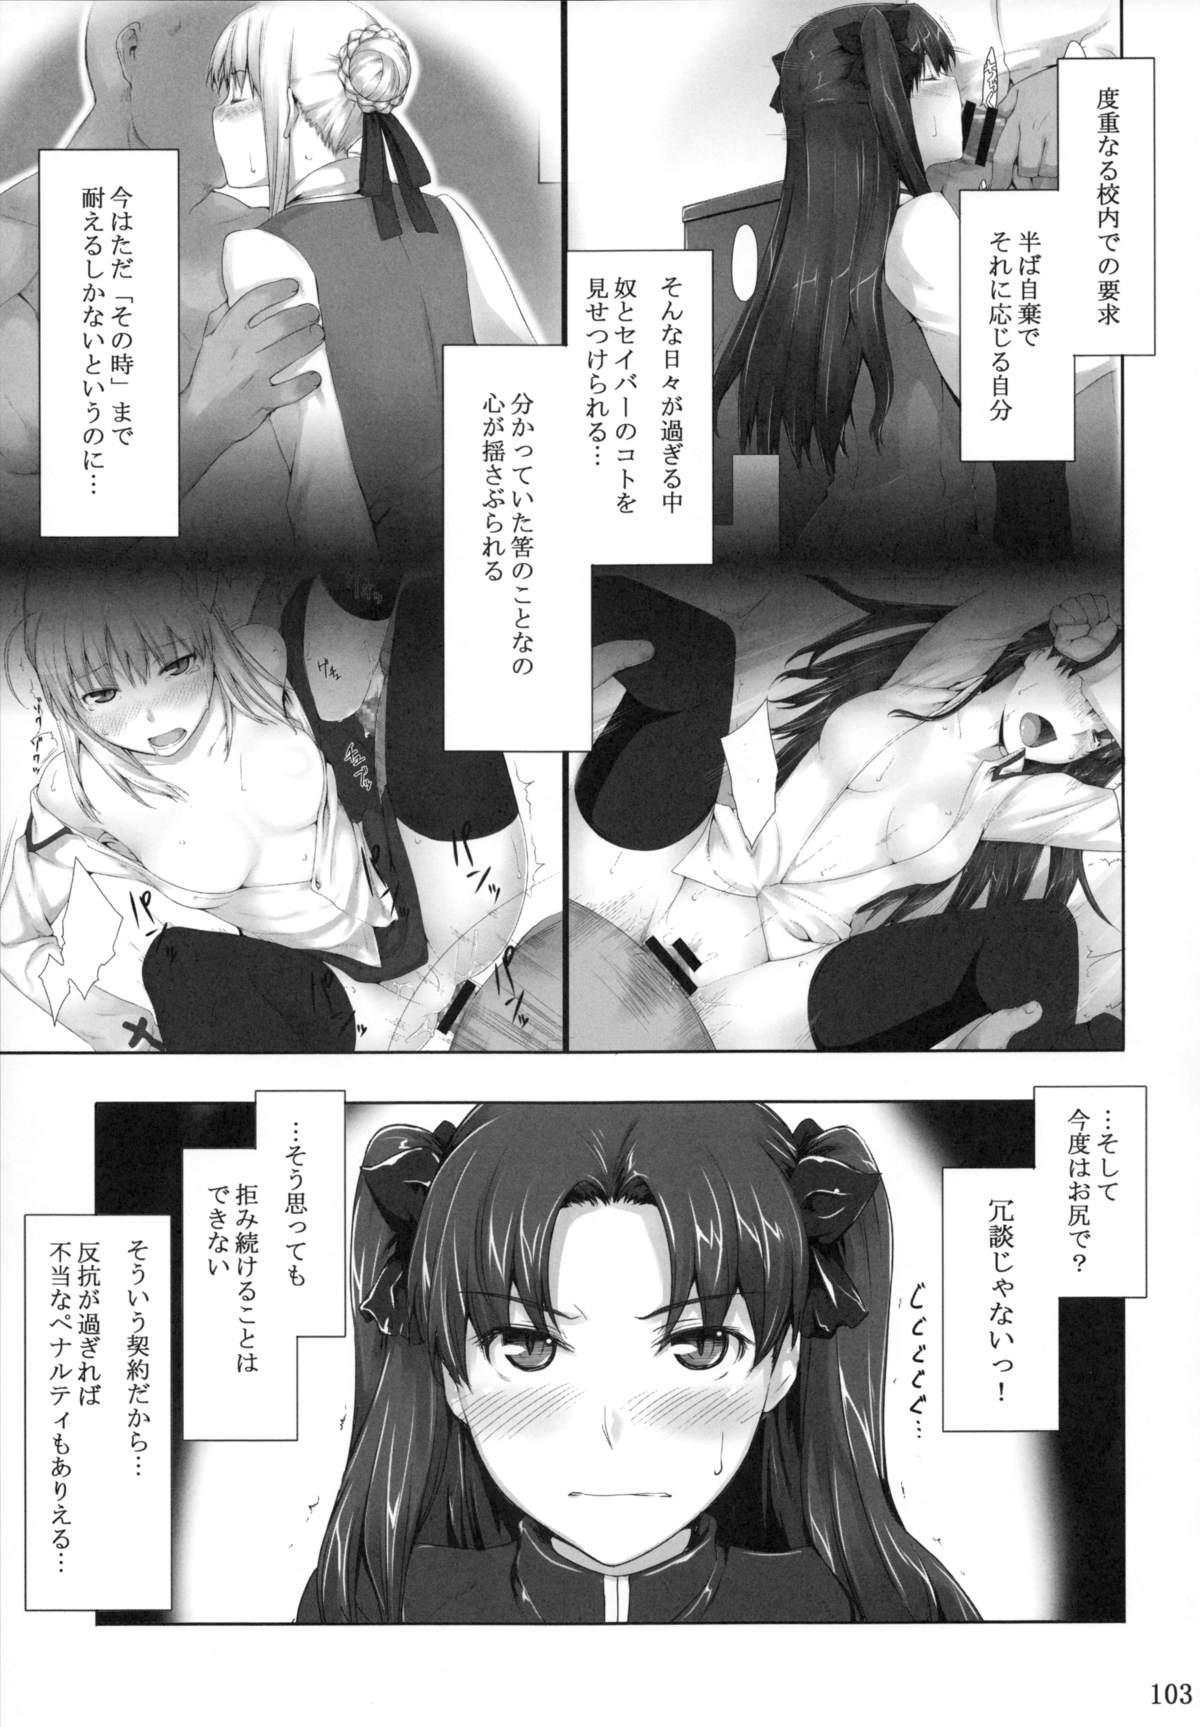 Tosaka-ke no Kakei Jijou Soushuuhen 1 102